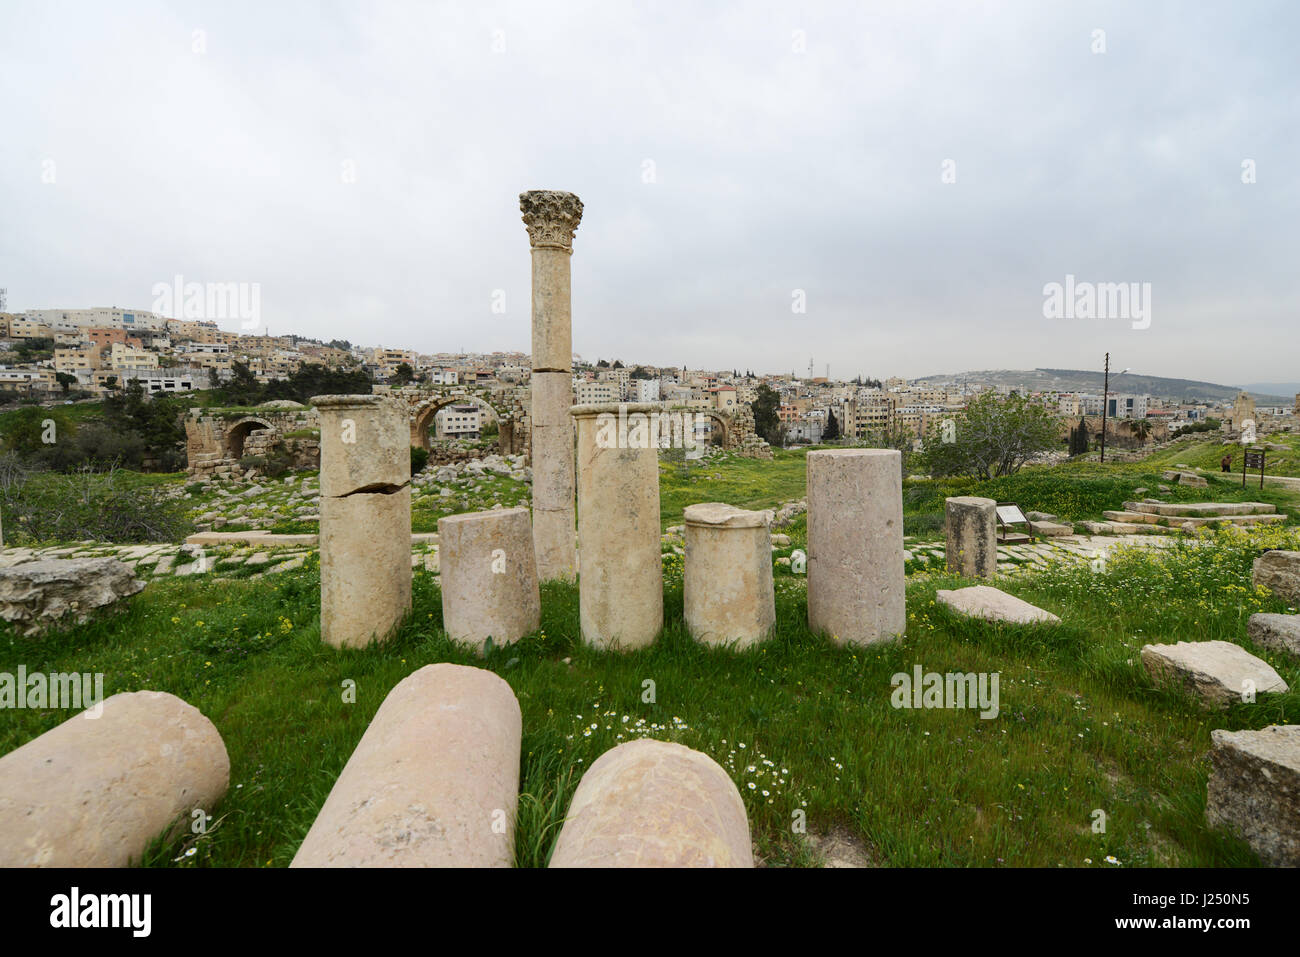 ancient Roman columns in the ancient Roman city of Jerash in Jordan. - Stock Image